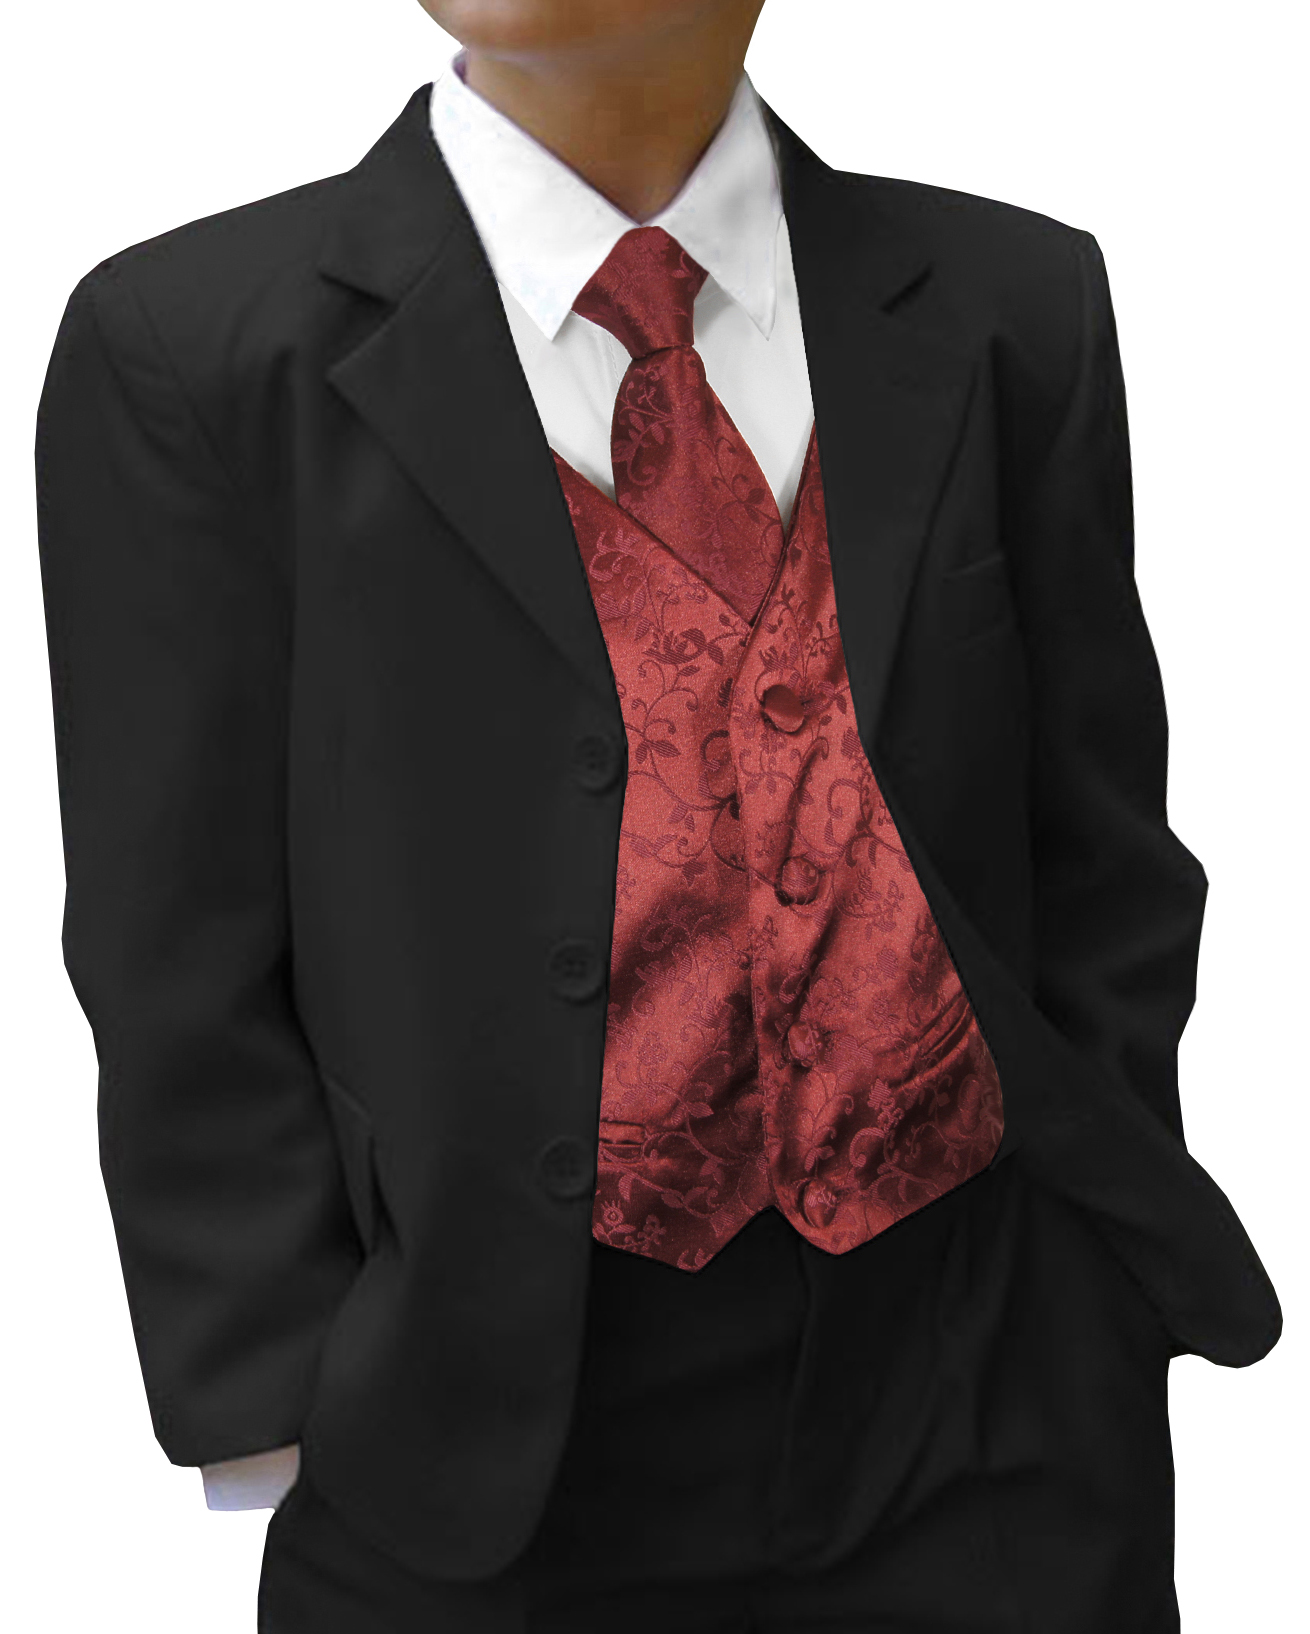 Paul Malone Shop - Wedding tuxedo black with boys suit black red